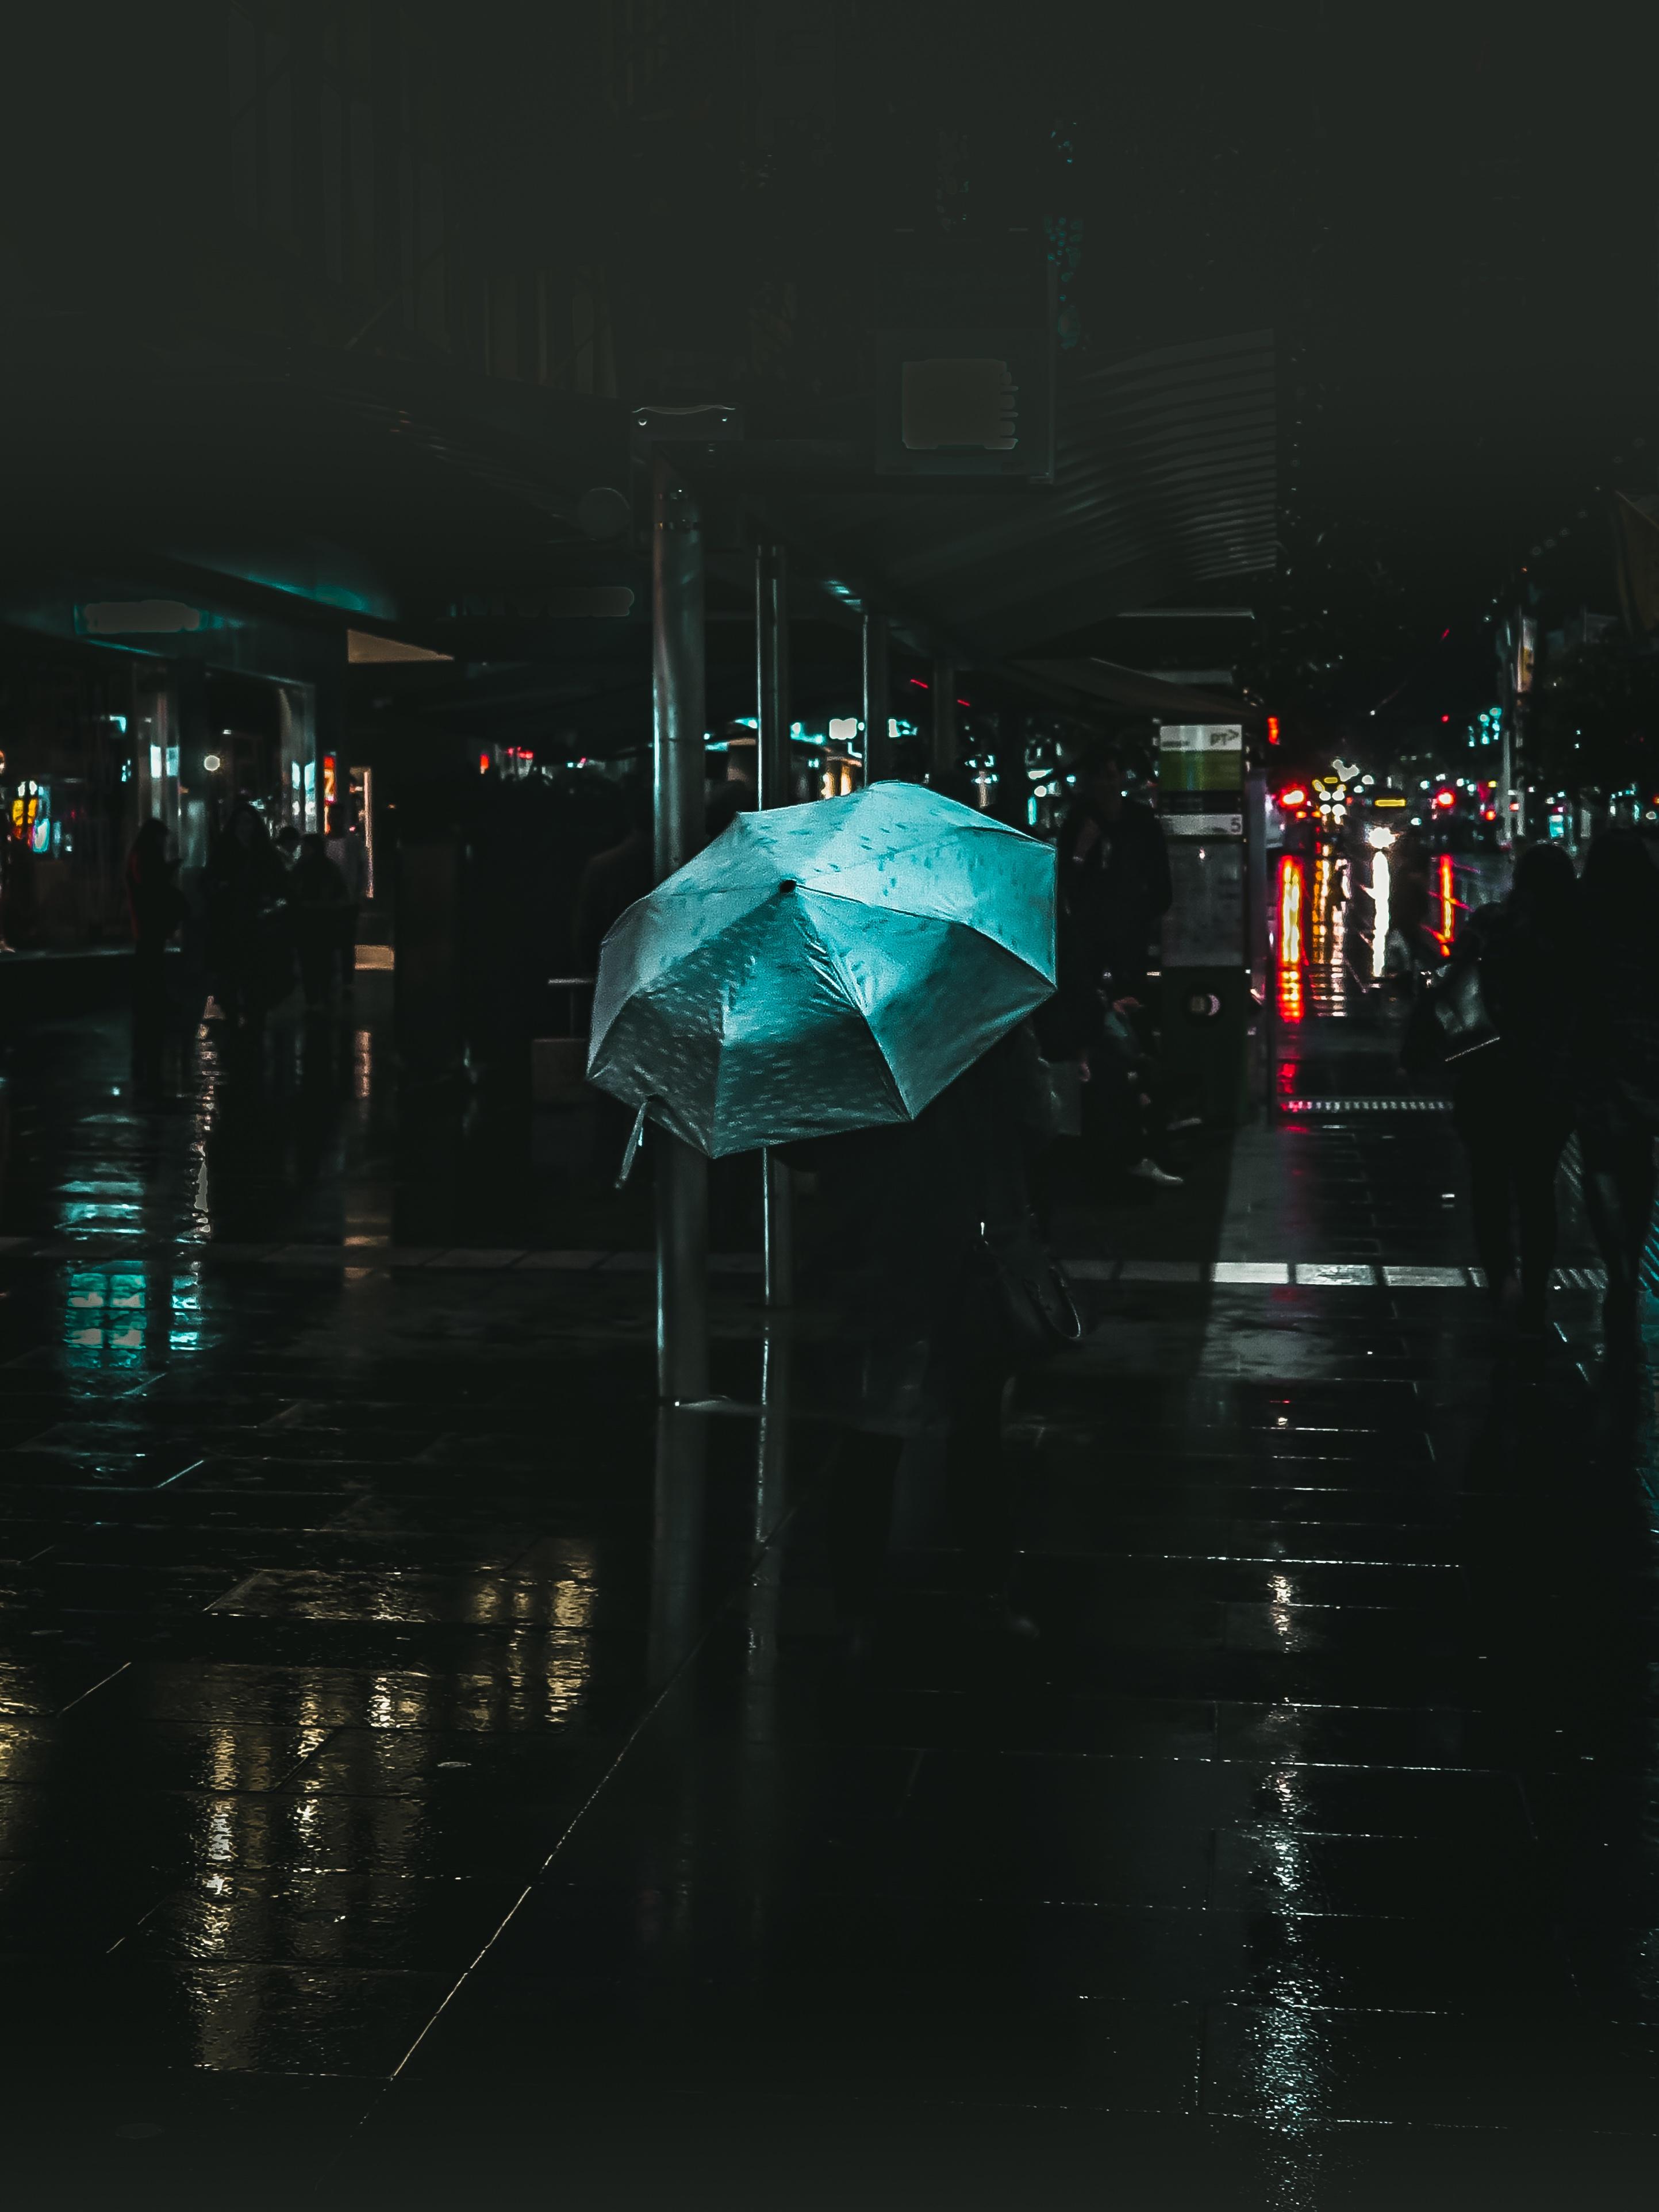 habit of rainy nights press - HD2886×3848